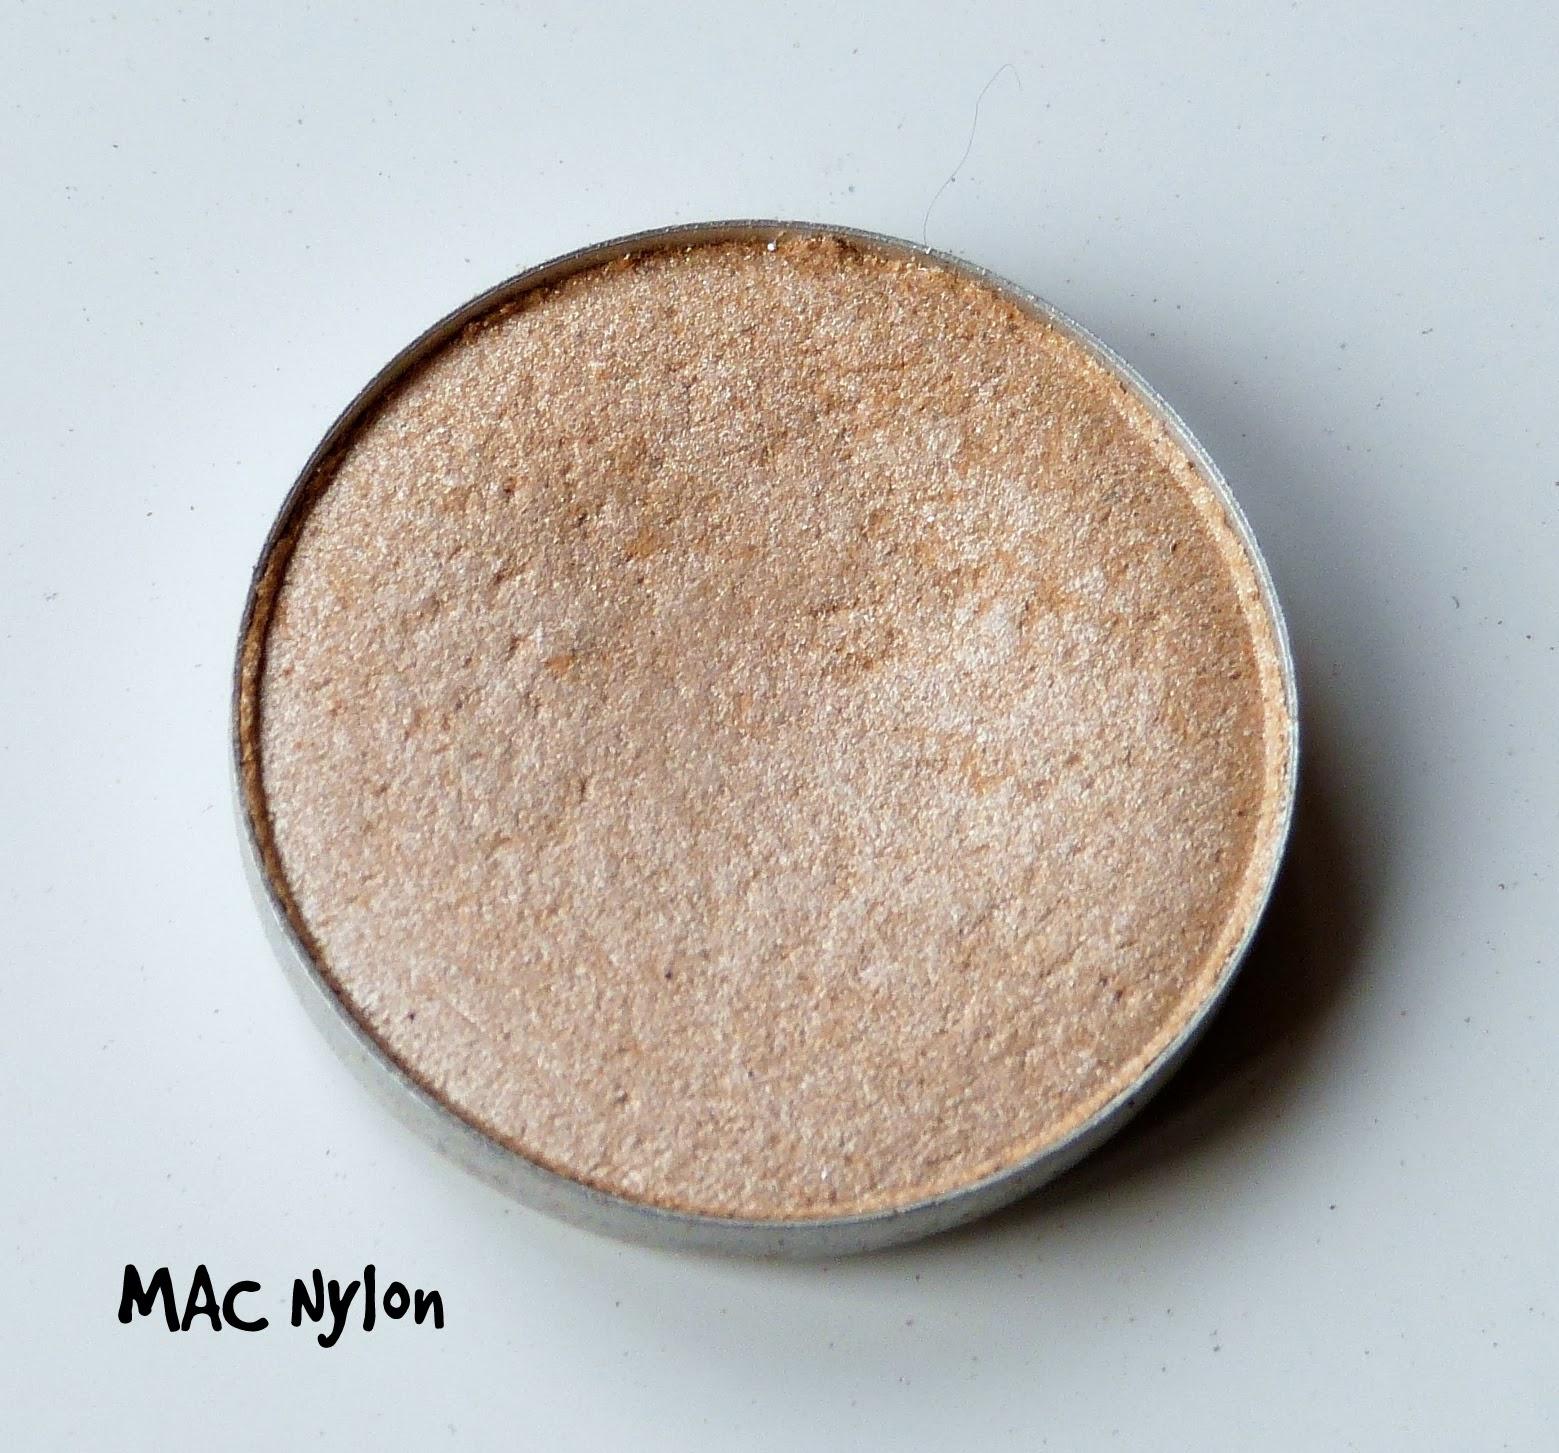 MAC Nylon